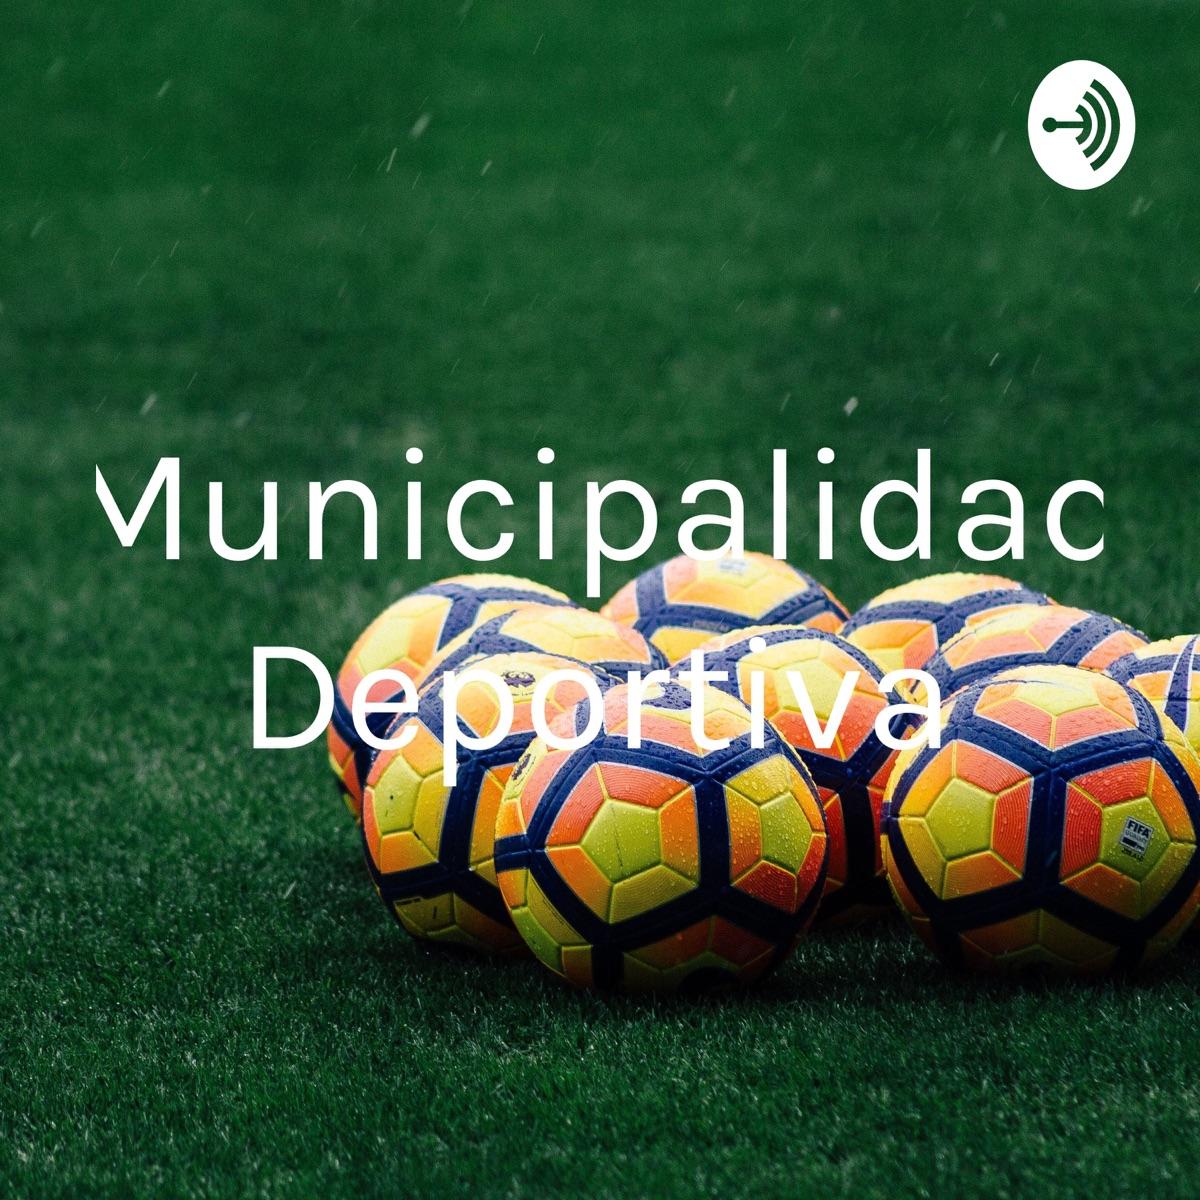 Municipalidad Deportiva